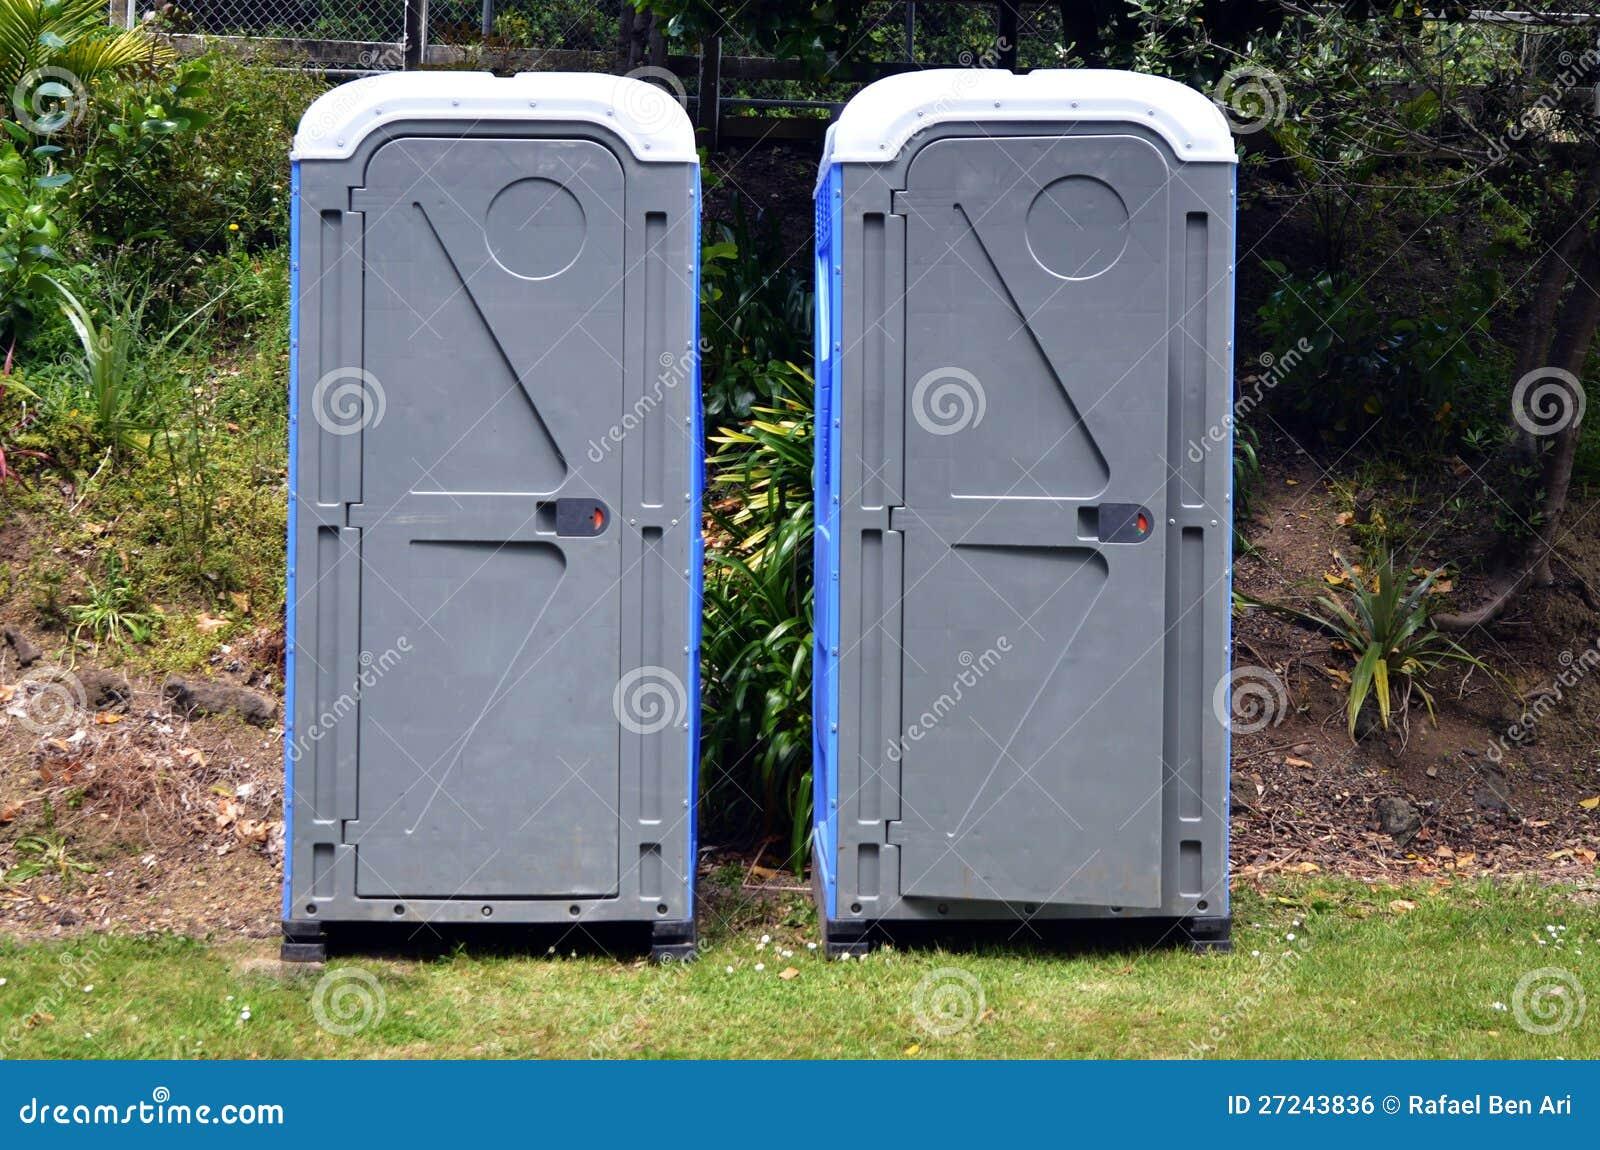 due bagni portatili